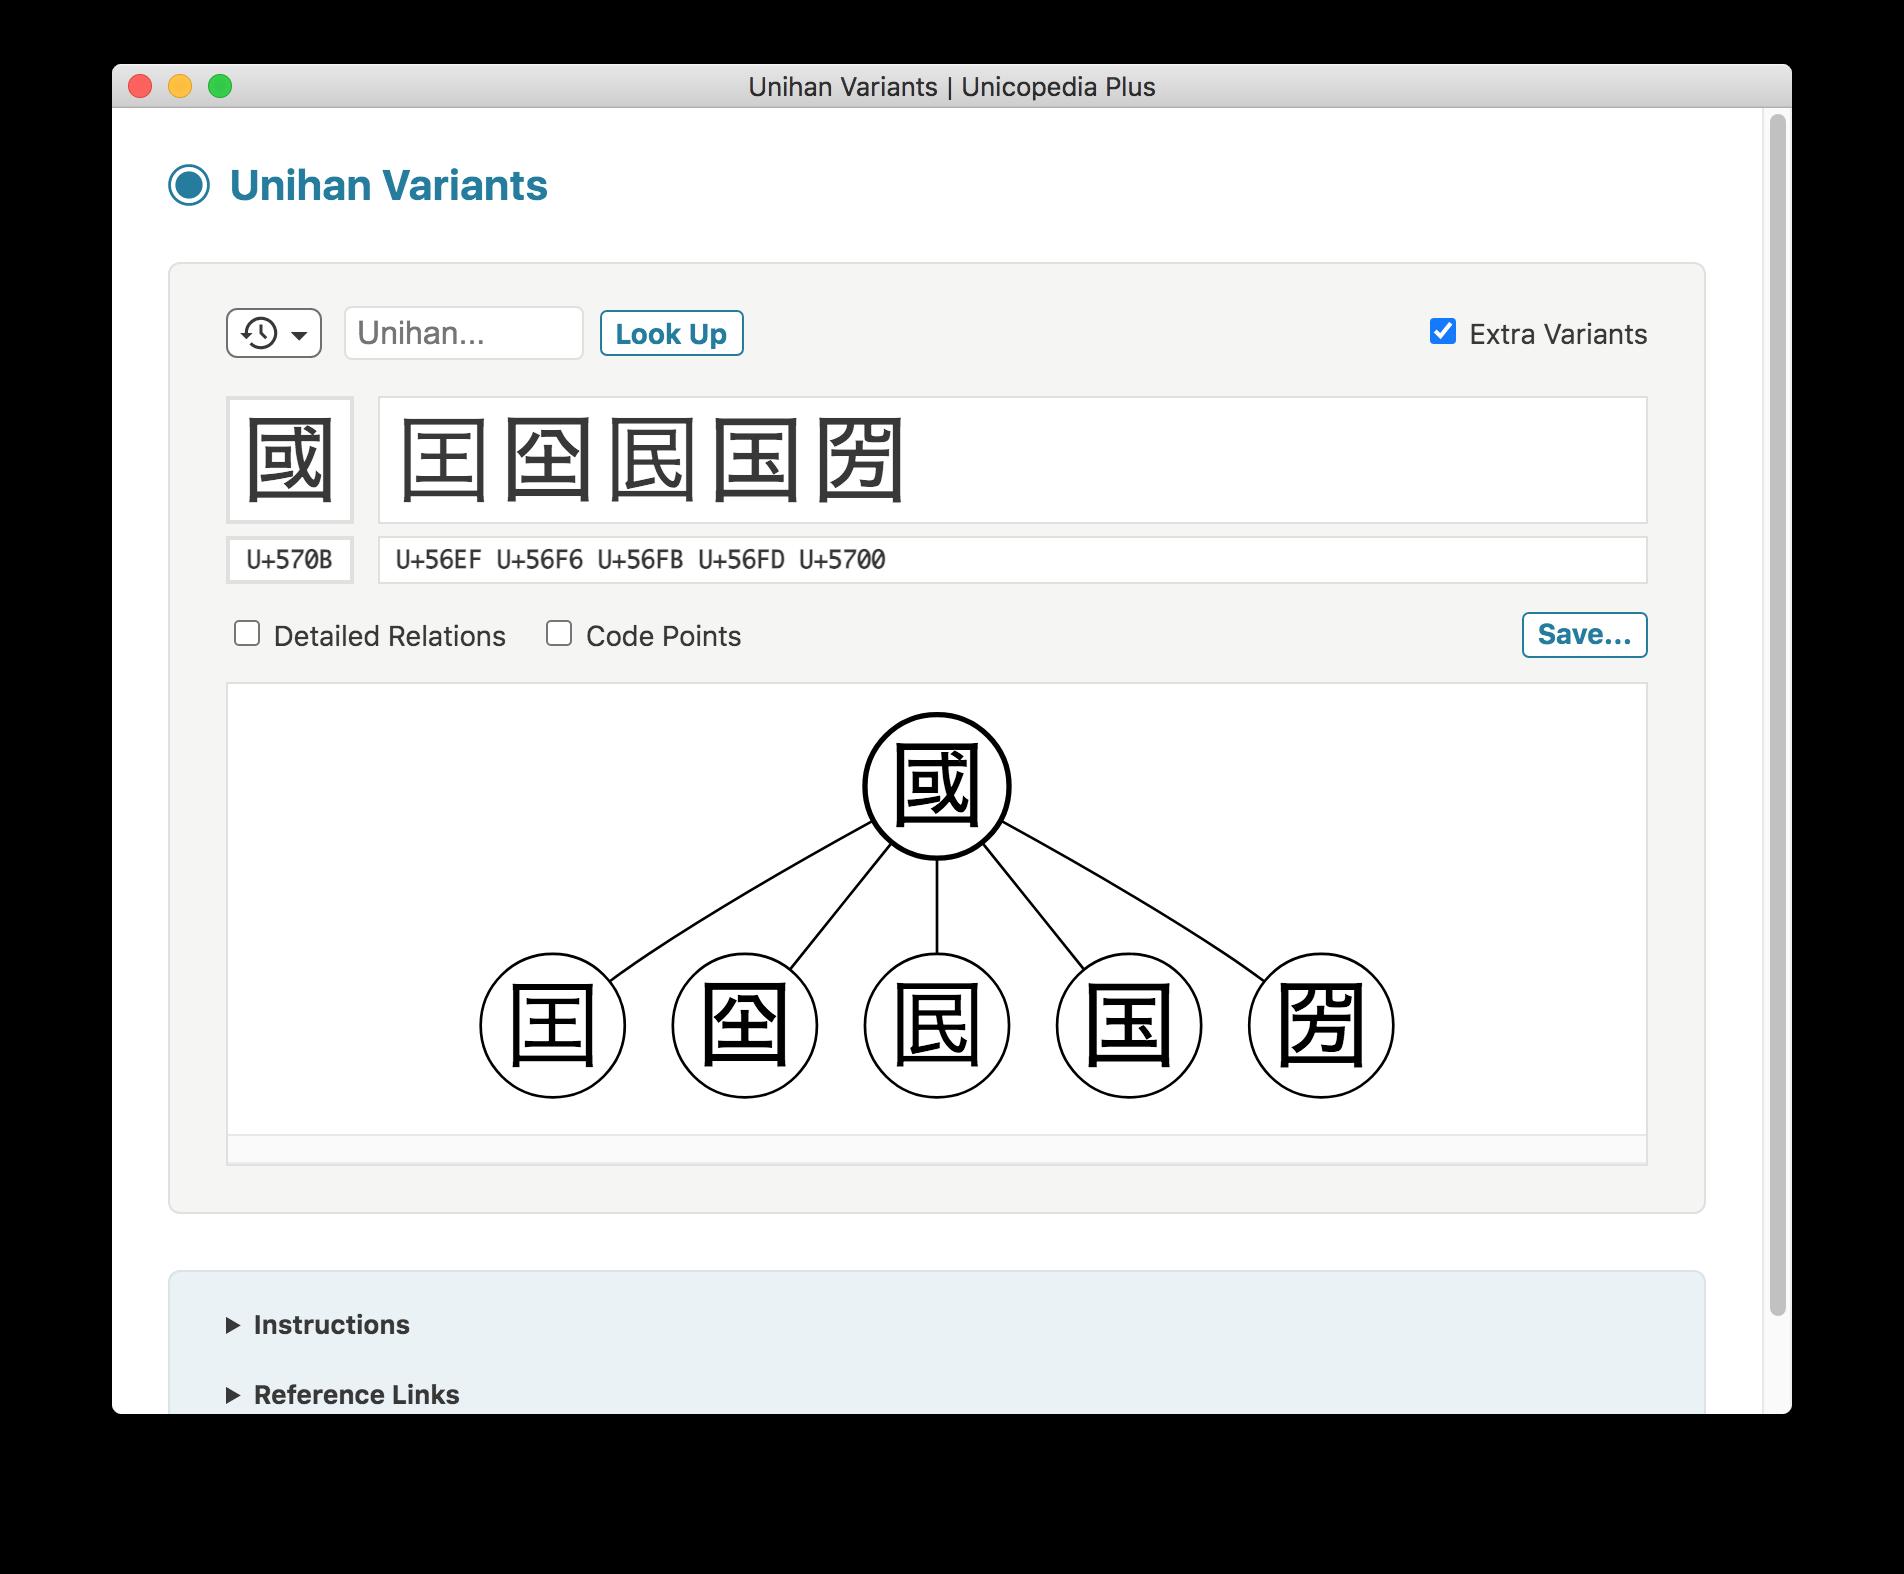 Unihan Variants screenshot